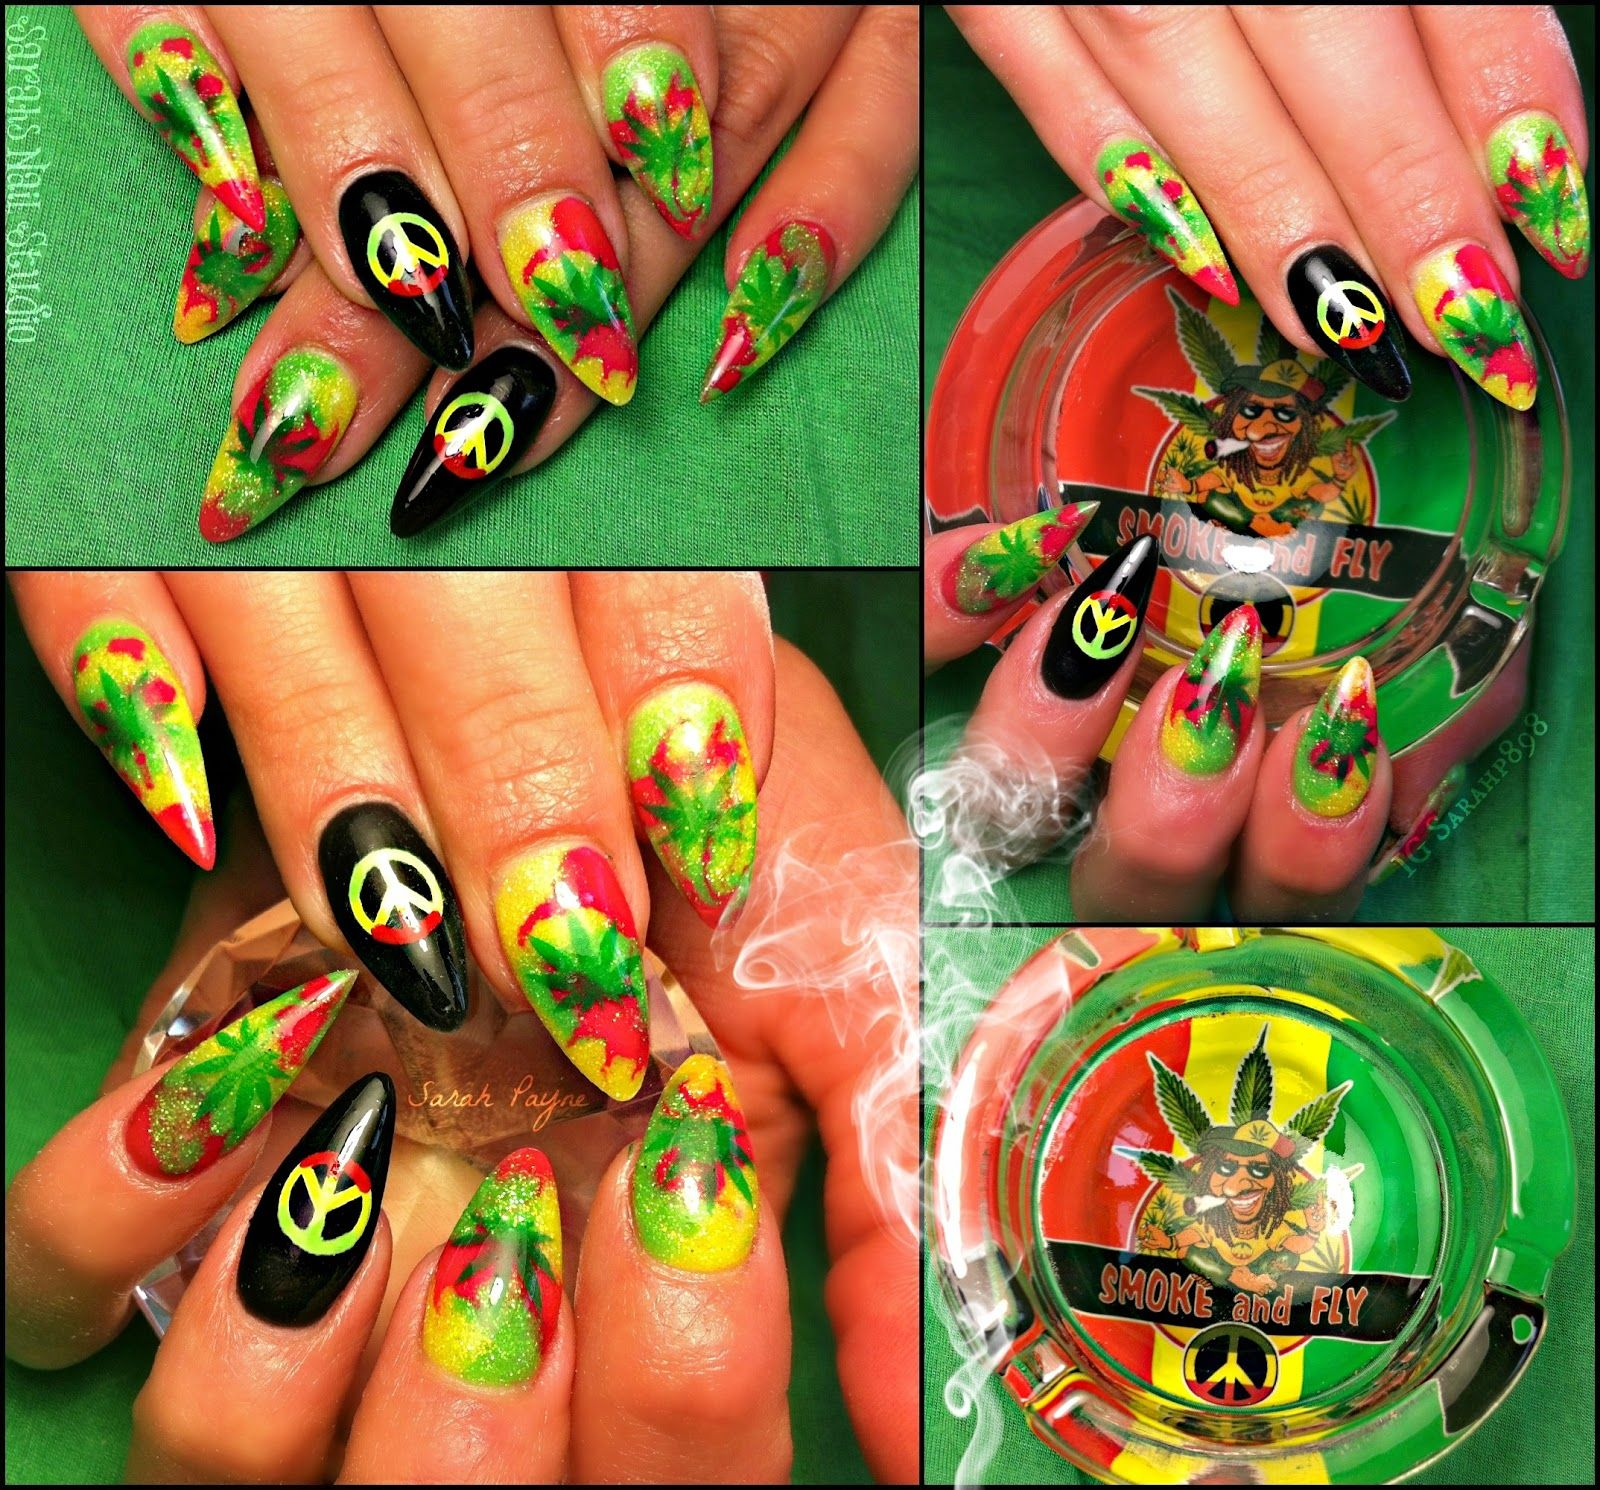 420 rasta stoner nails   Nails   Pinterest   Rasta nails, Nail nail ...